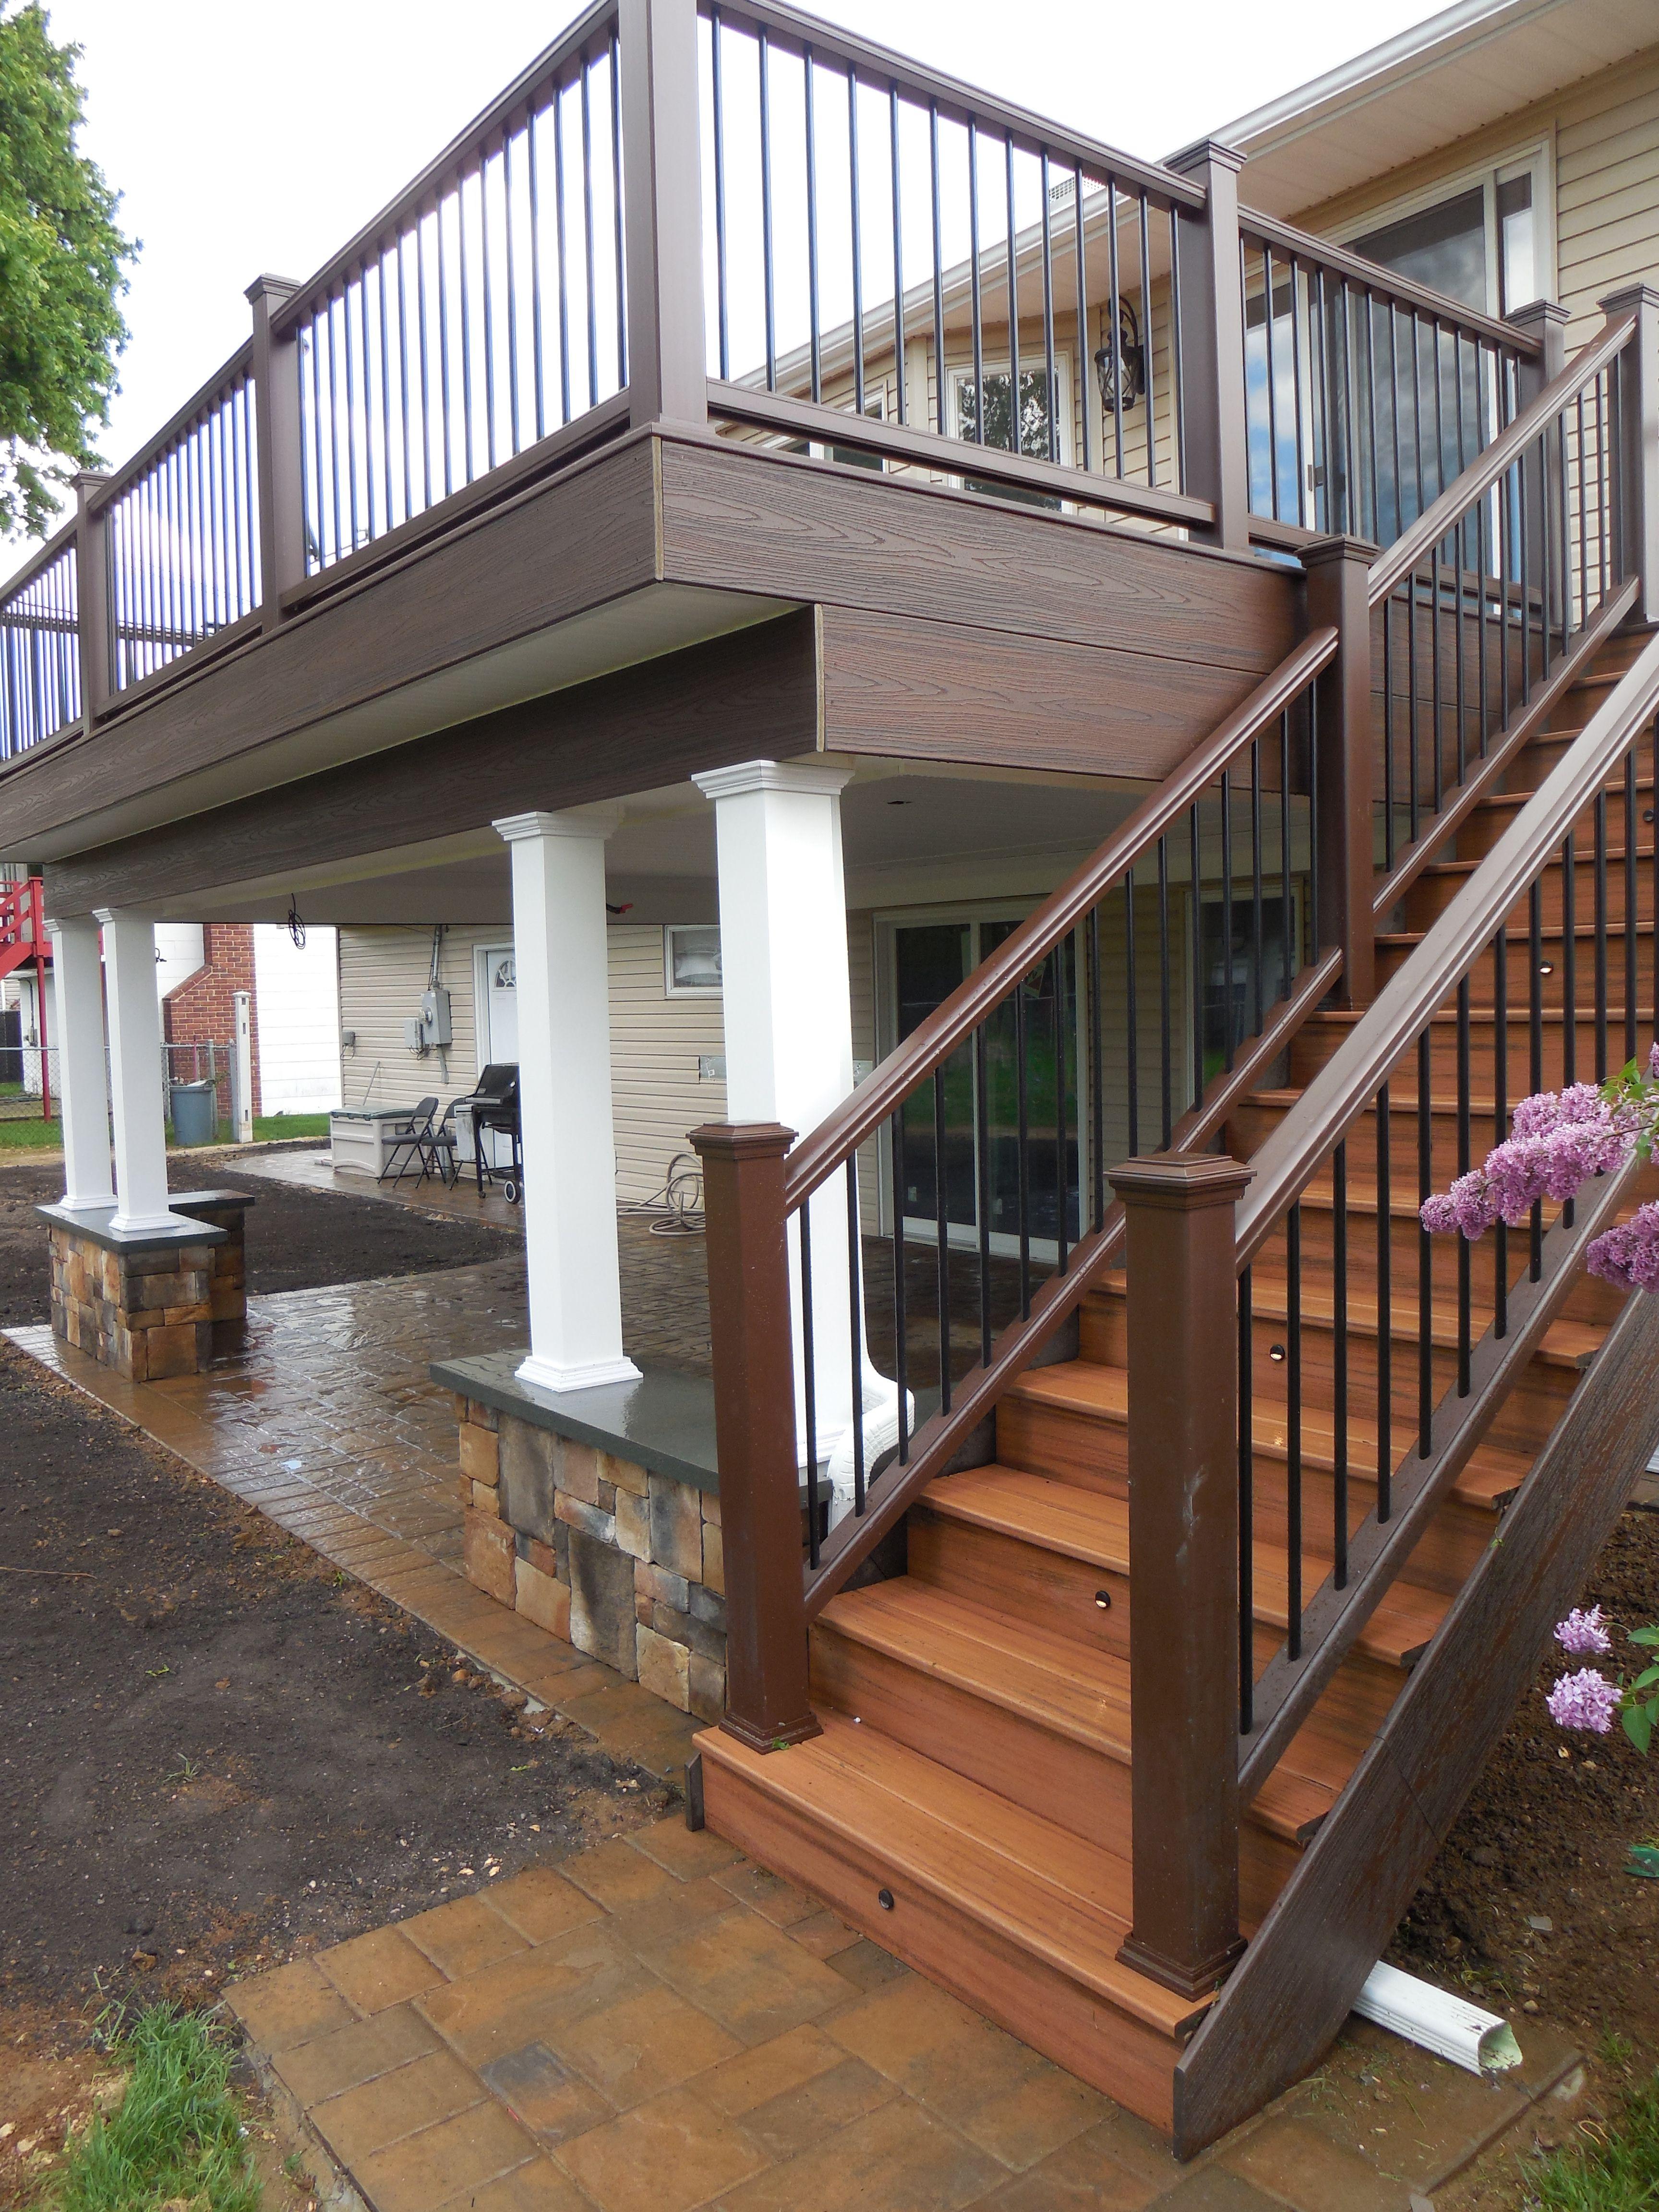 Second Floor Trex Deck With Custom Columns On Stone Walls Patio Deck Designs Porch Design Backyard Patio